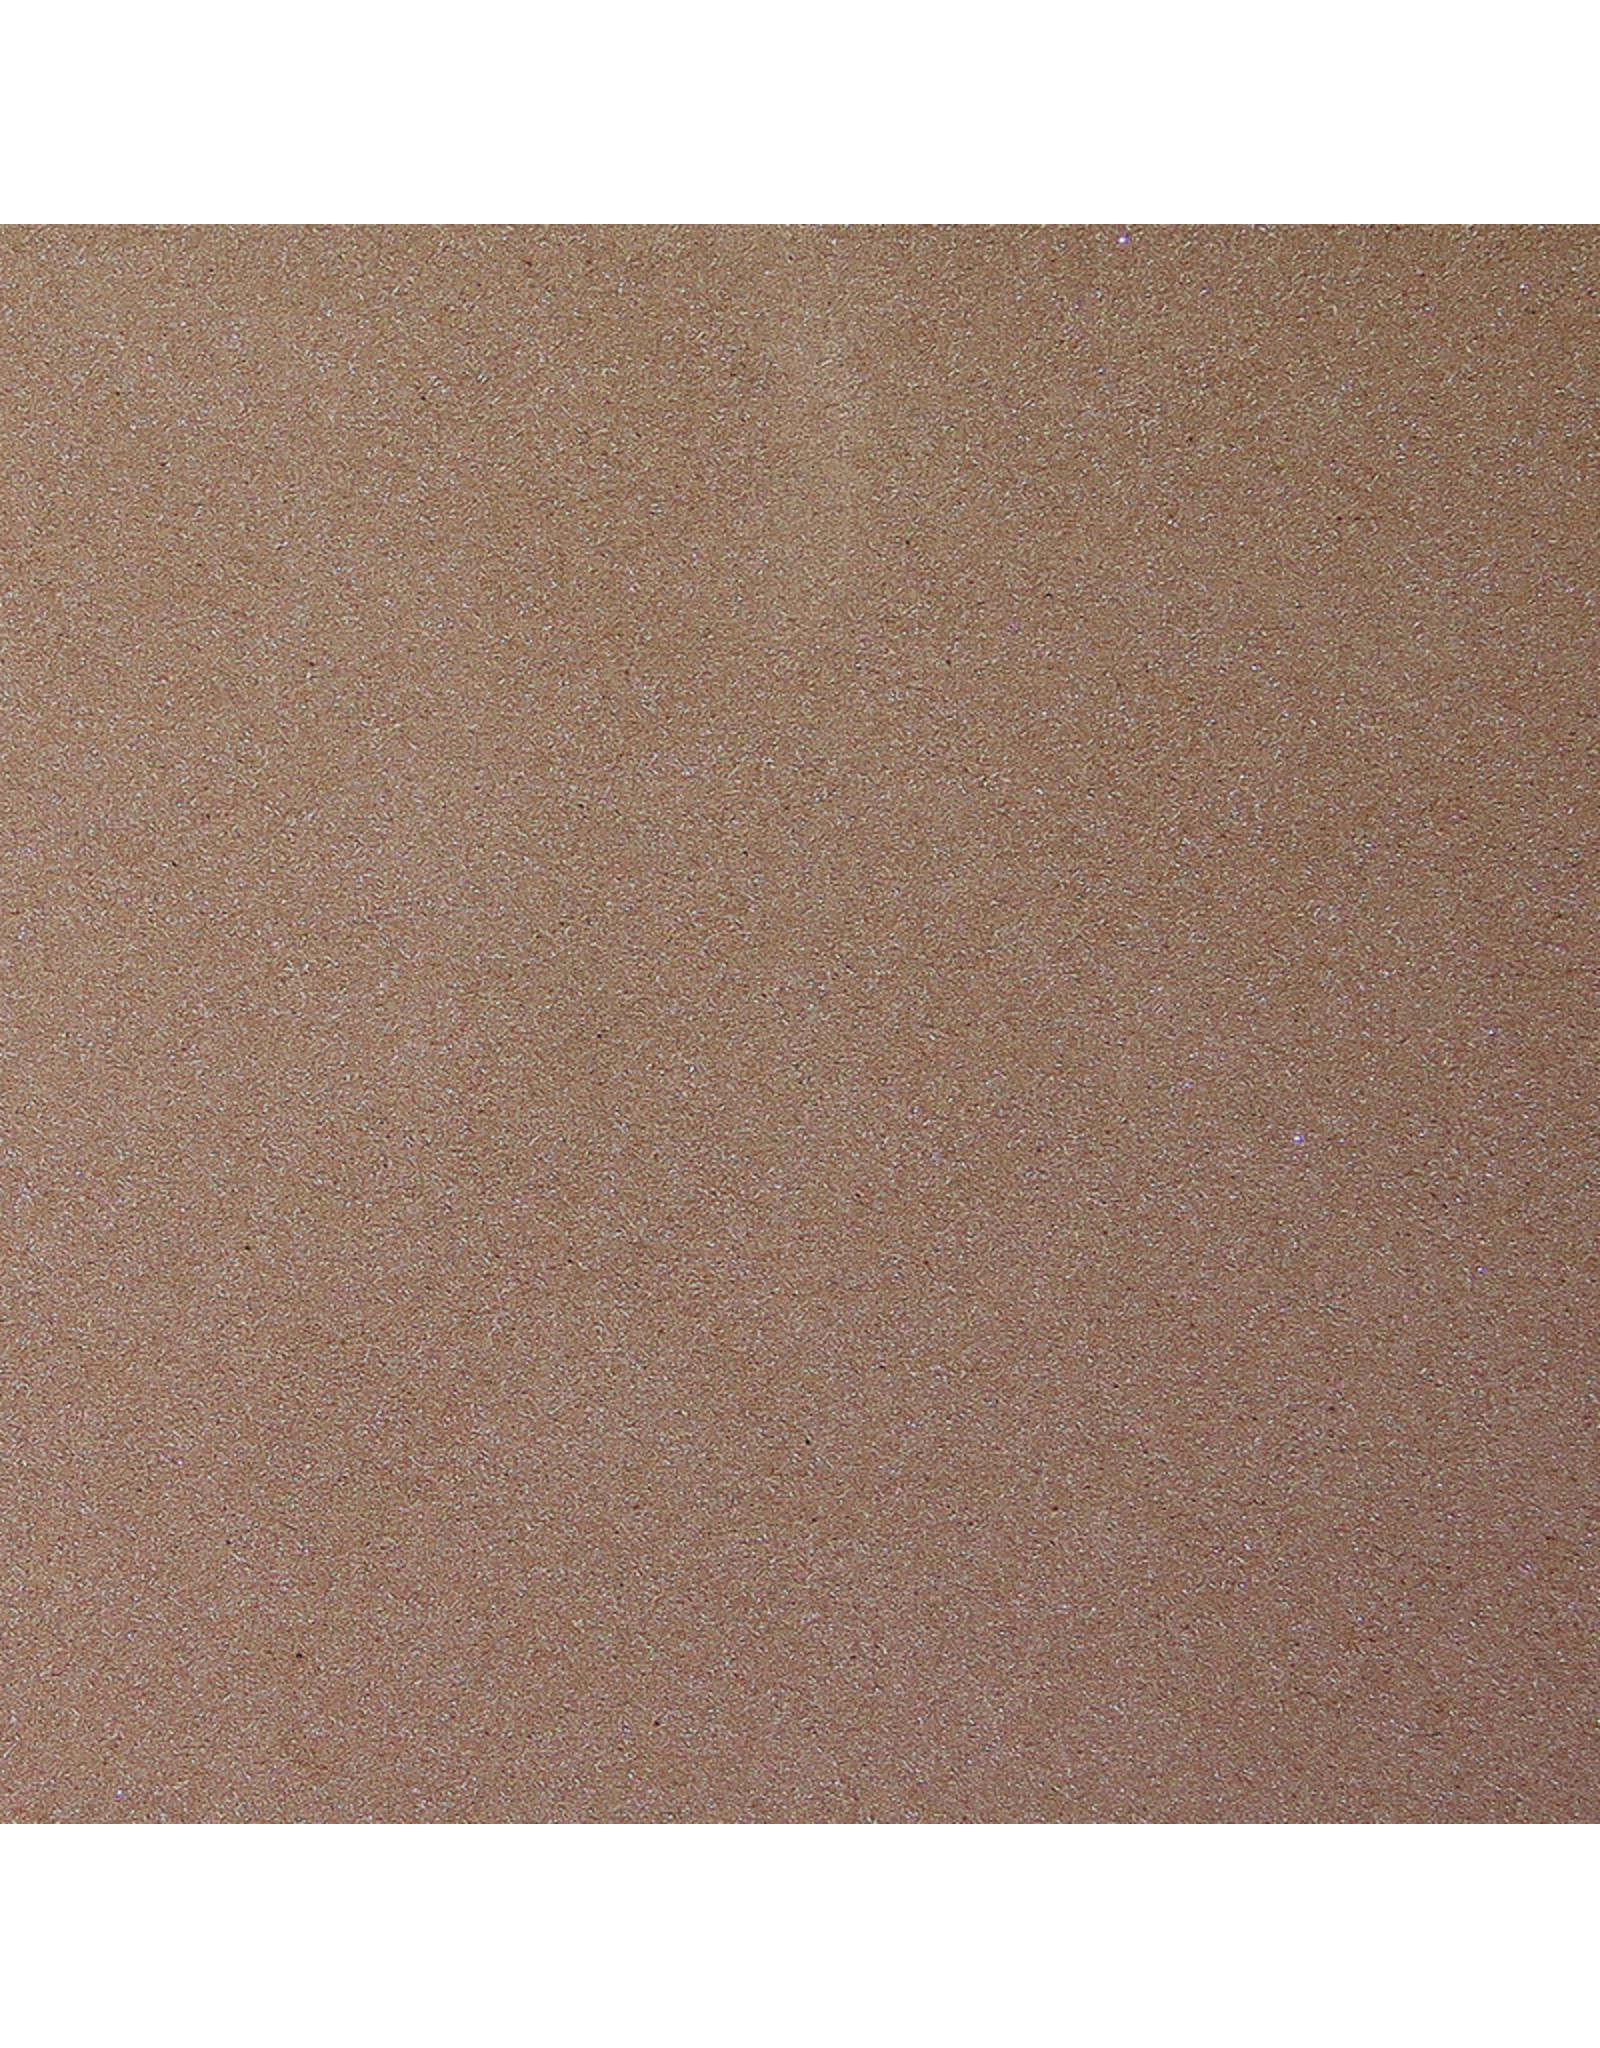 Hareline Thin Fly Foam 2mm Brown 2FF40